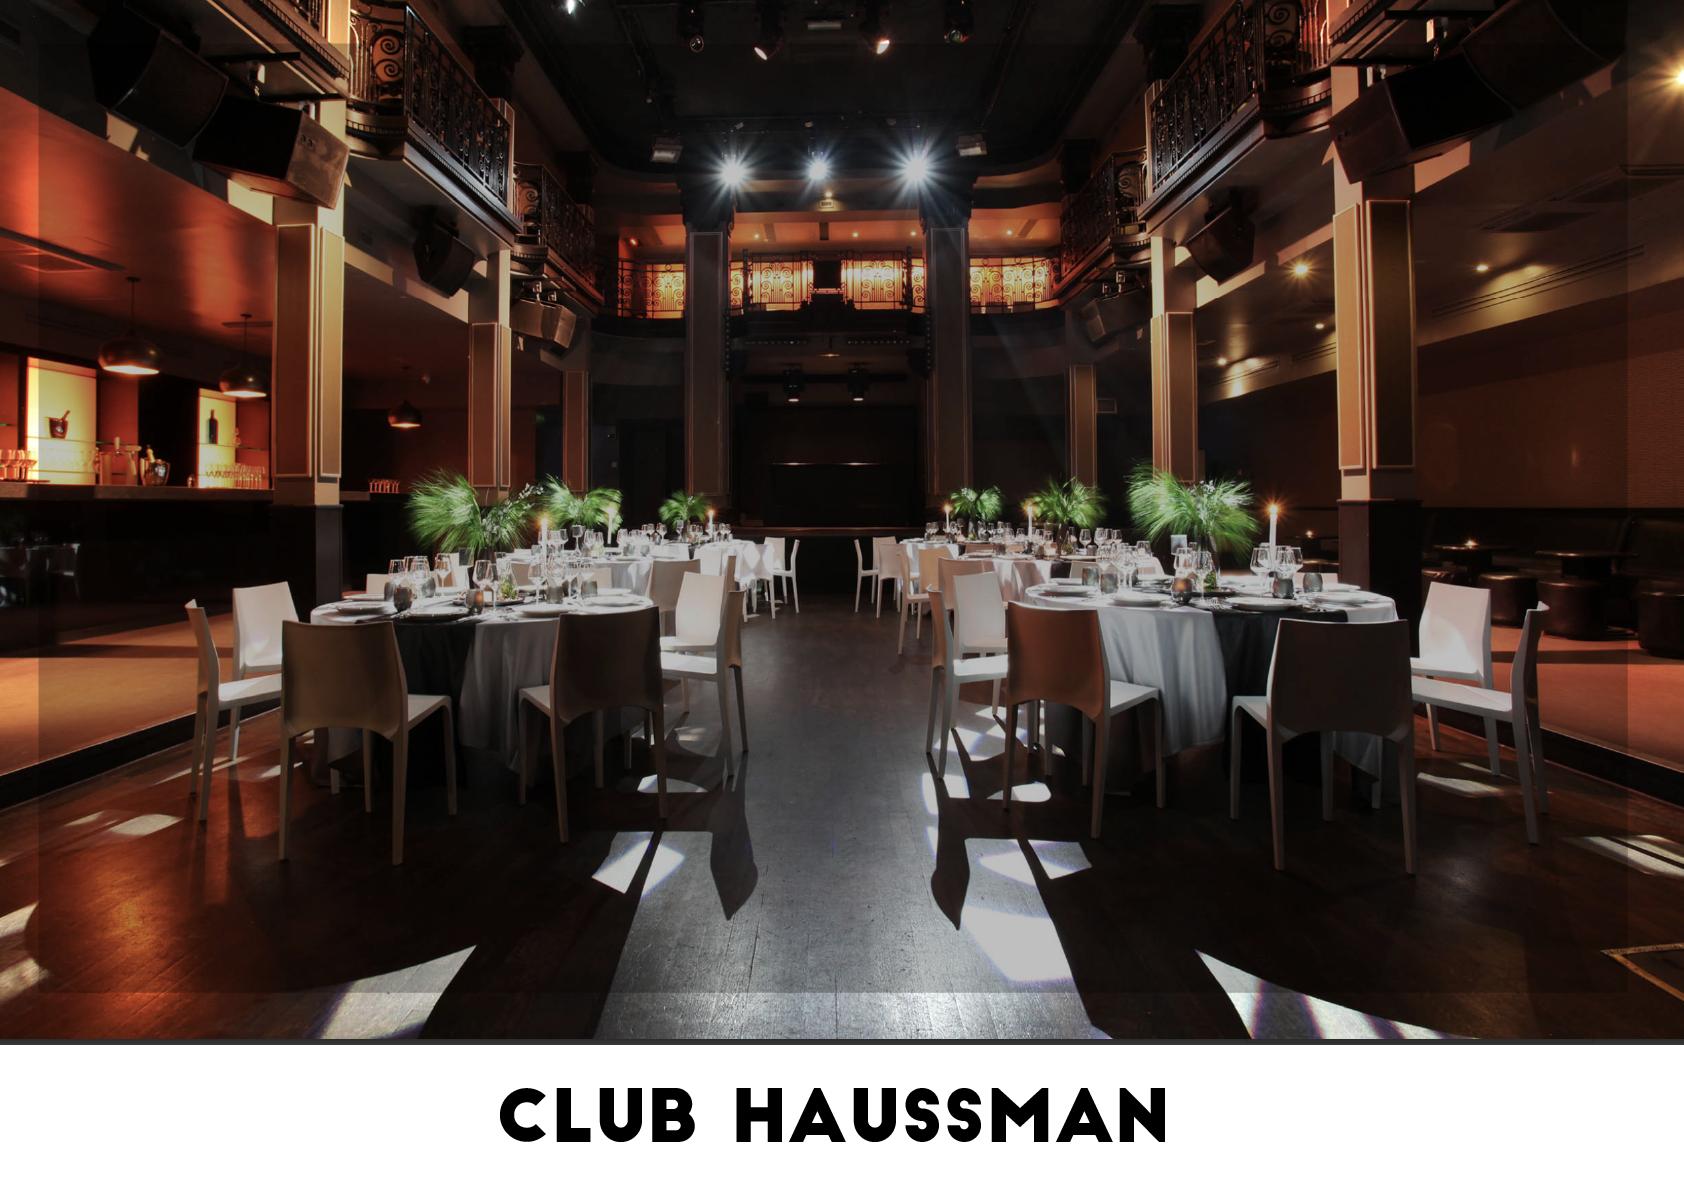 Club Haussman